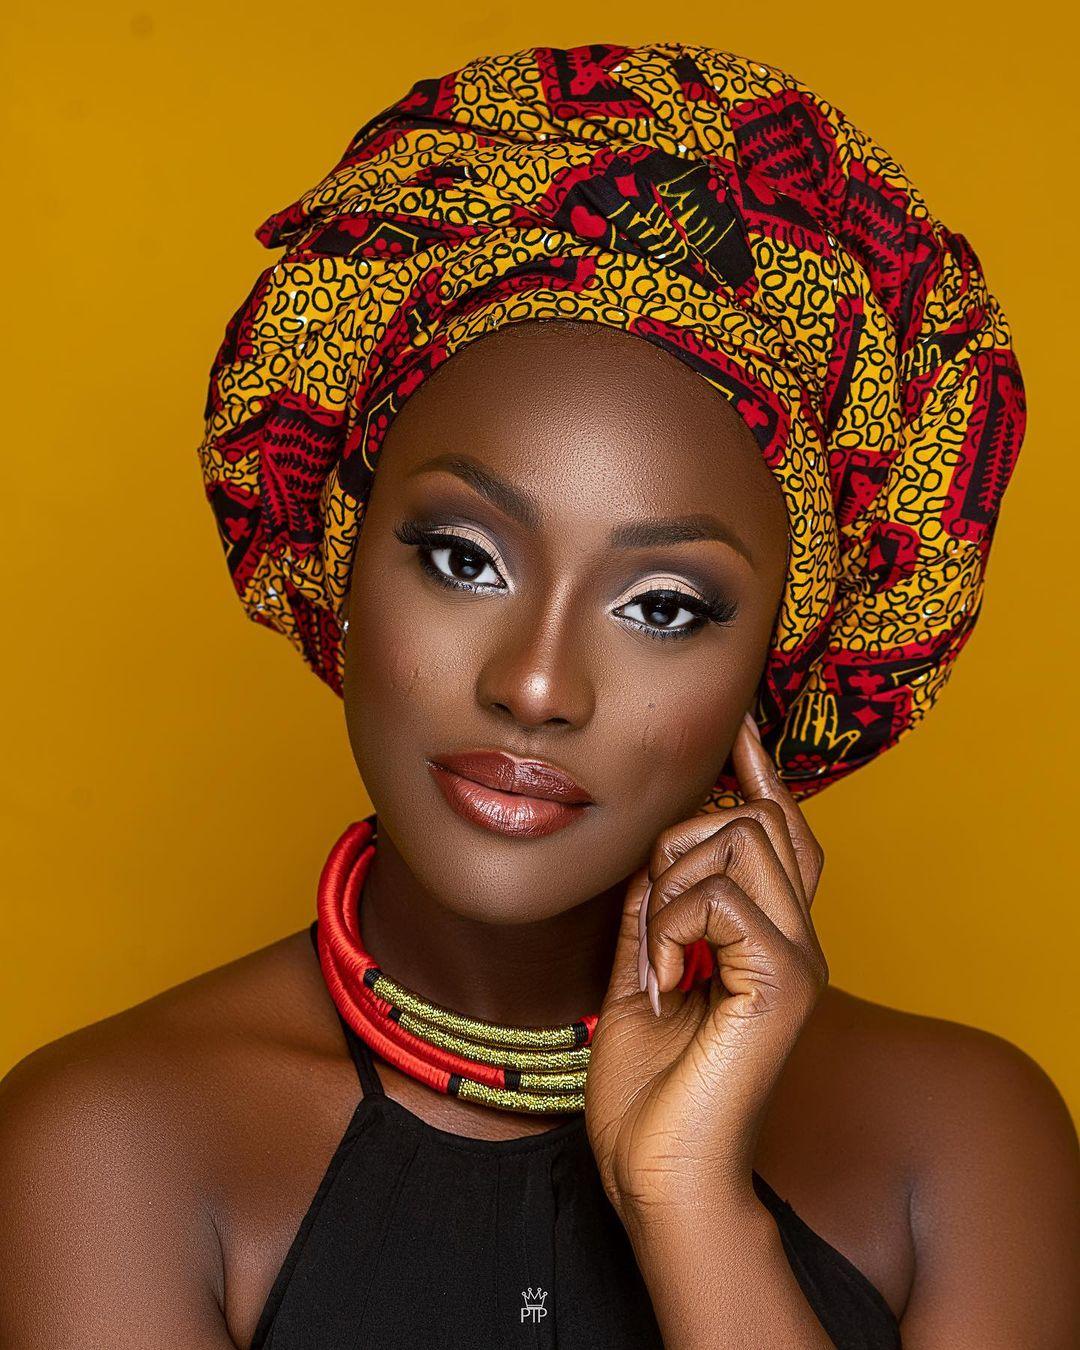 most-beautiful-women-africa-2020-linda-osifo